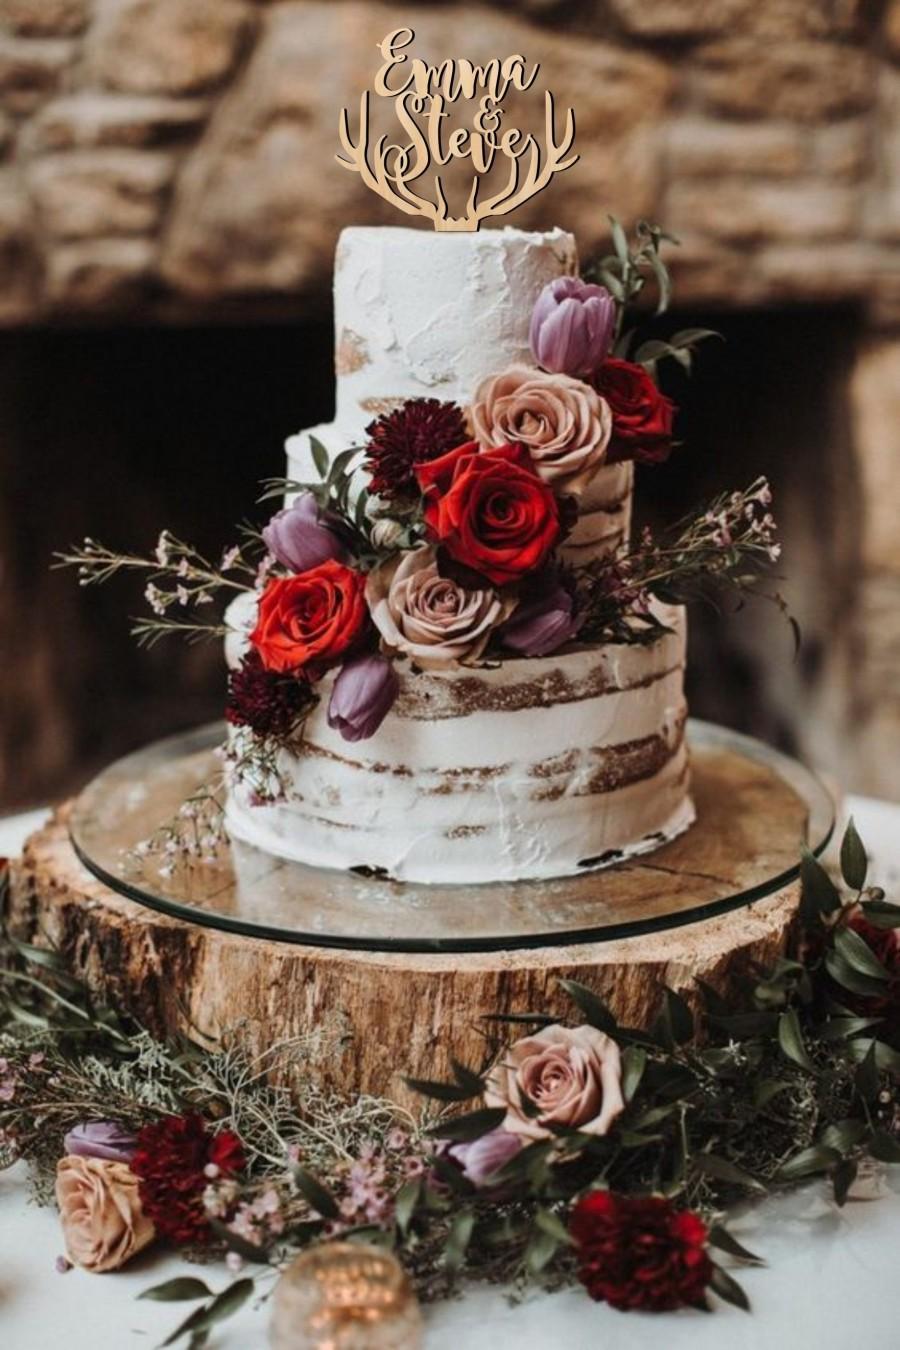 Wedding - Cake topper for wedding, deer antlers cake topper, names cake topper, antlers topper, wedding cake topper, wooden cake topper, custom made